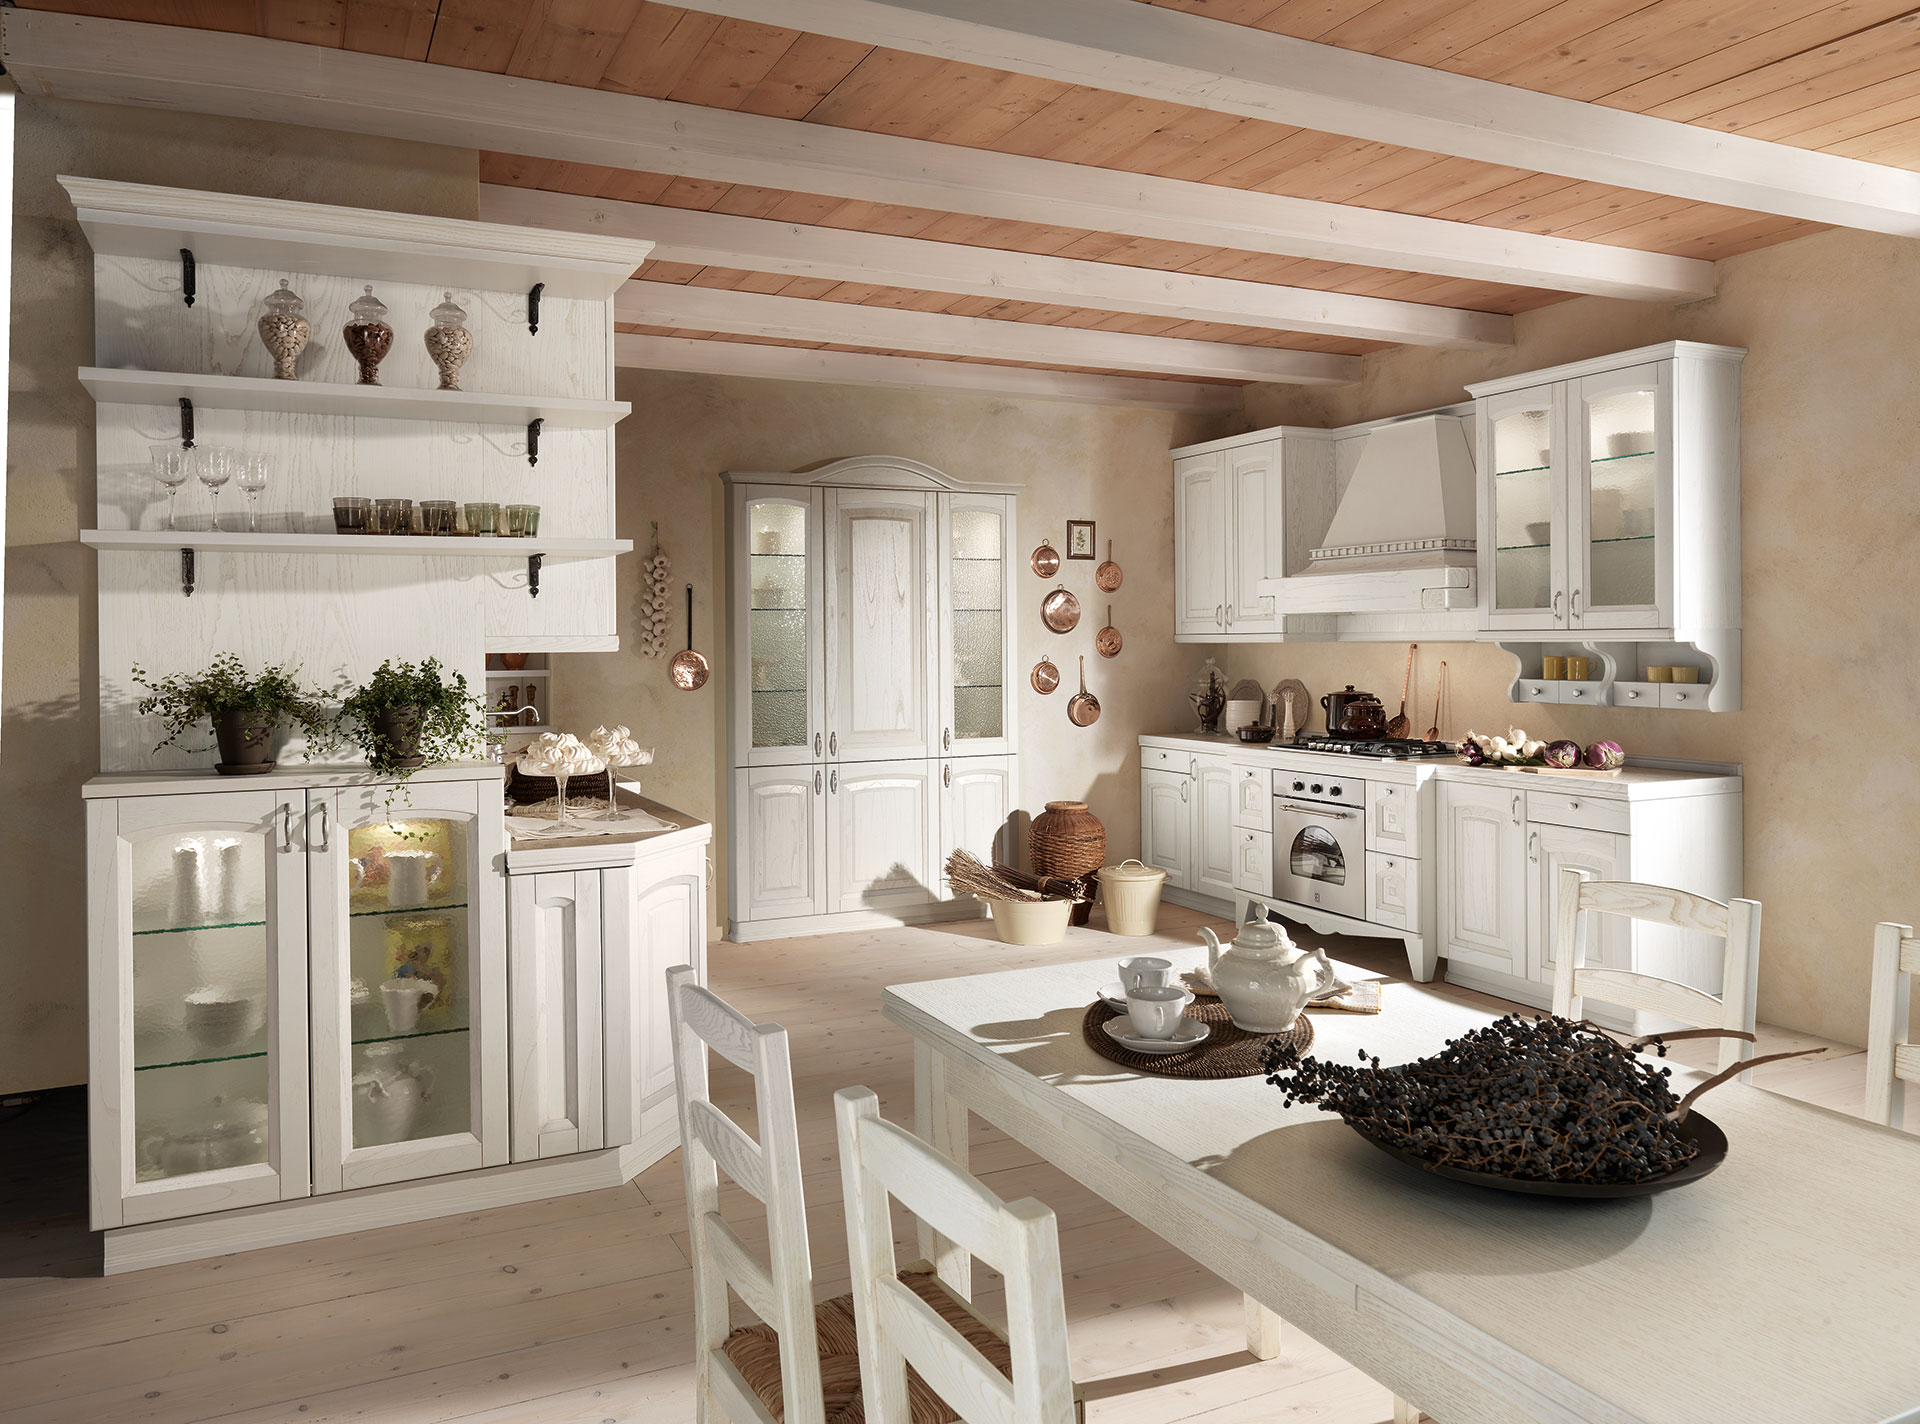 Cucine classiche antares - Arredamento cucina classica ...